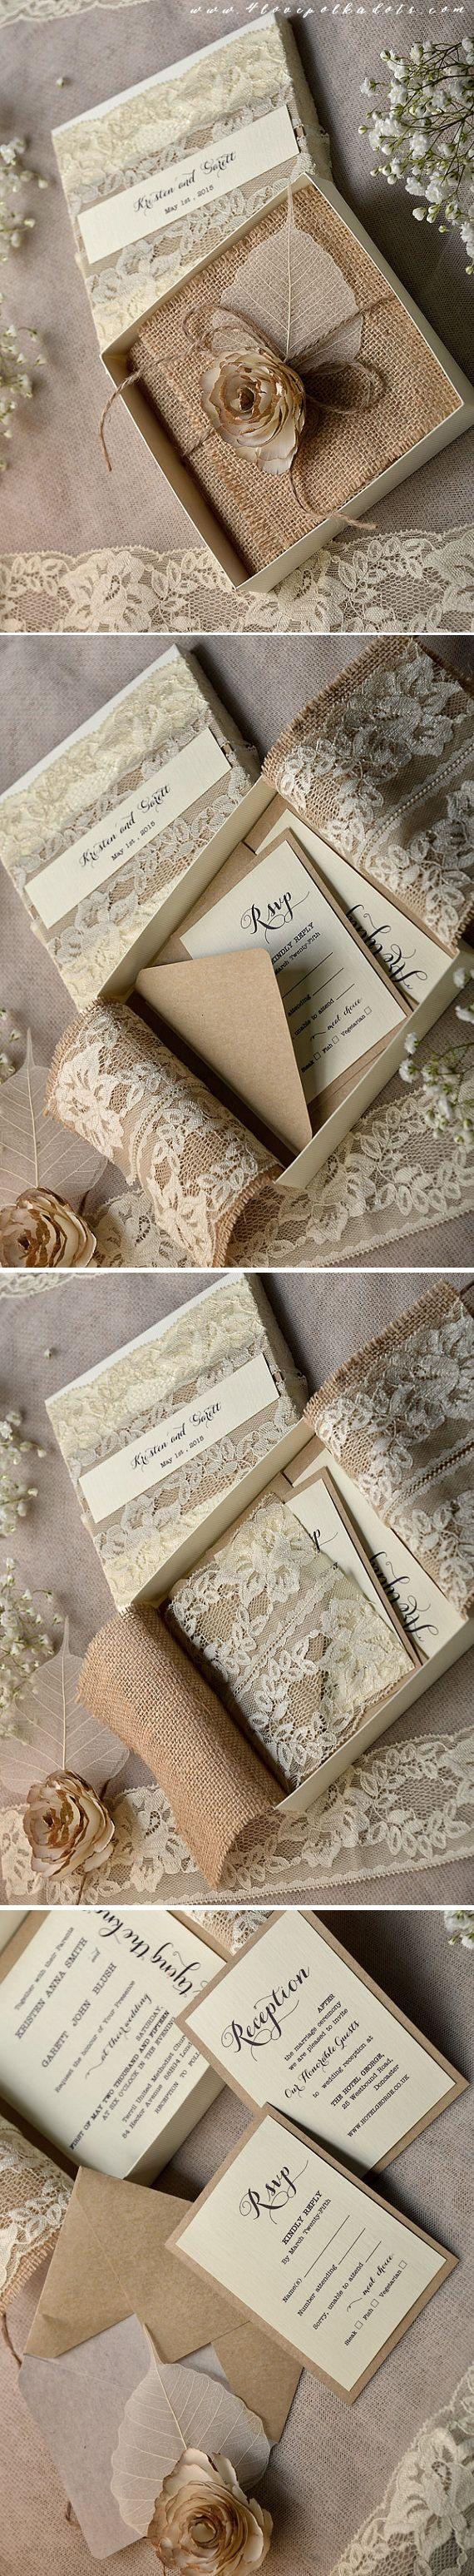 Wedding Invitation in a box Burlap